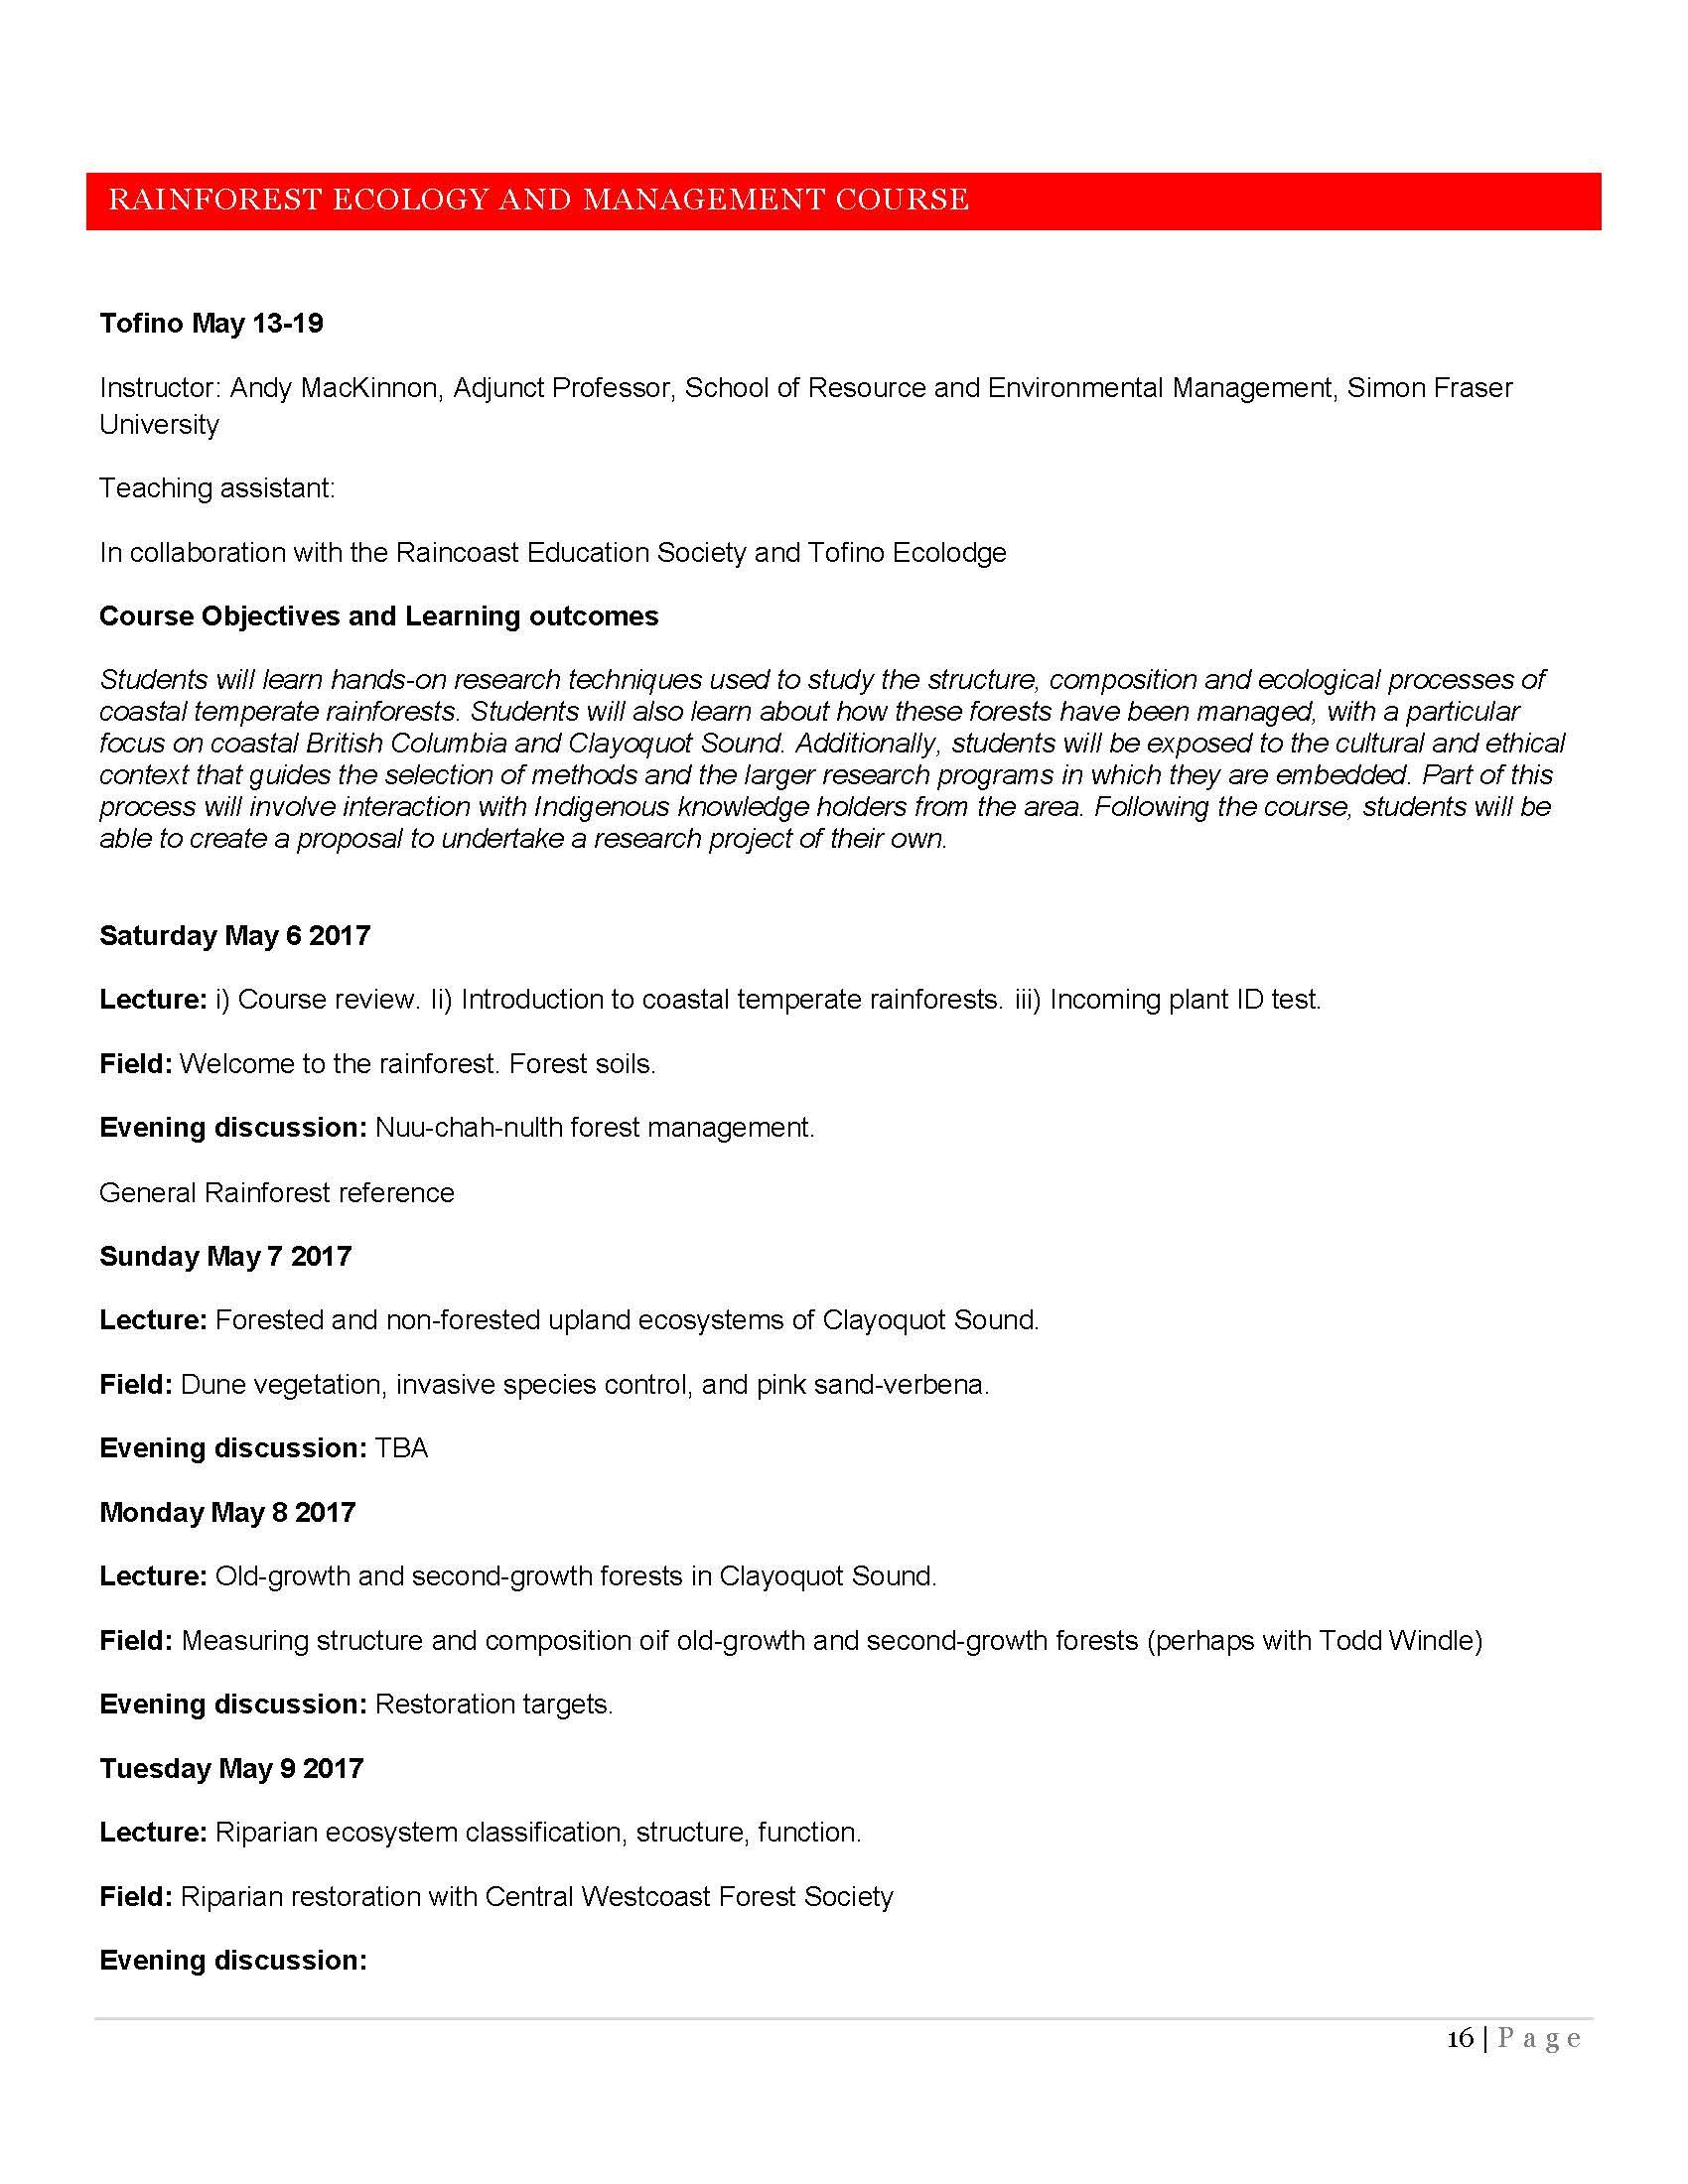 TFN Bulletin March 15-2017_Page_16.jpg